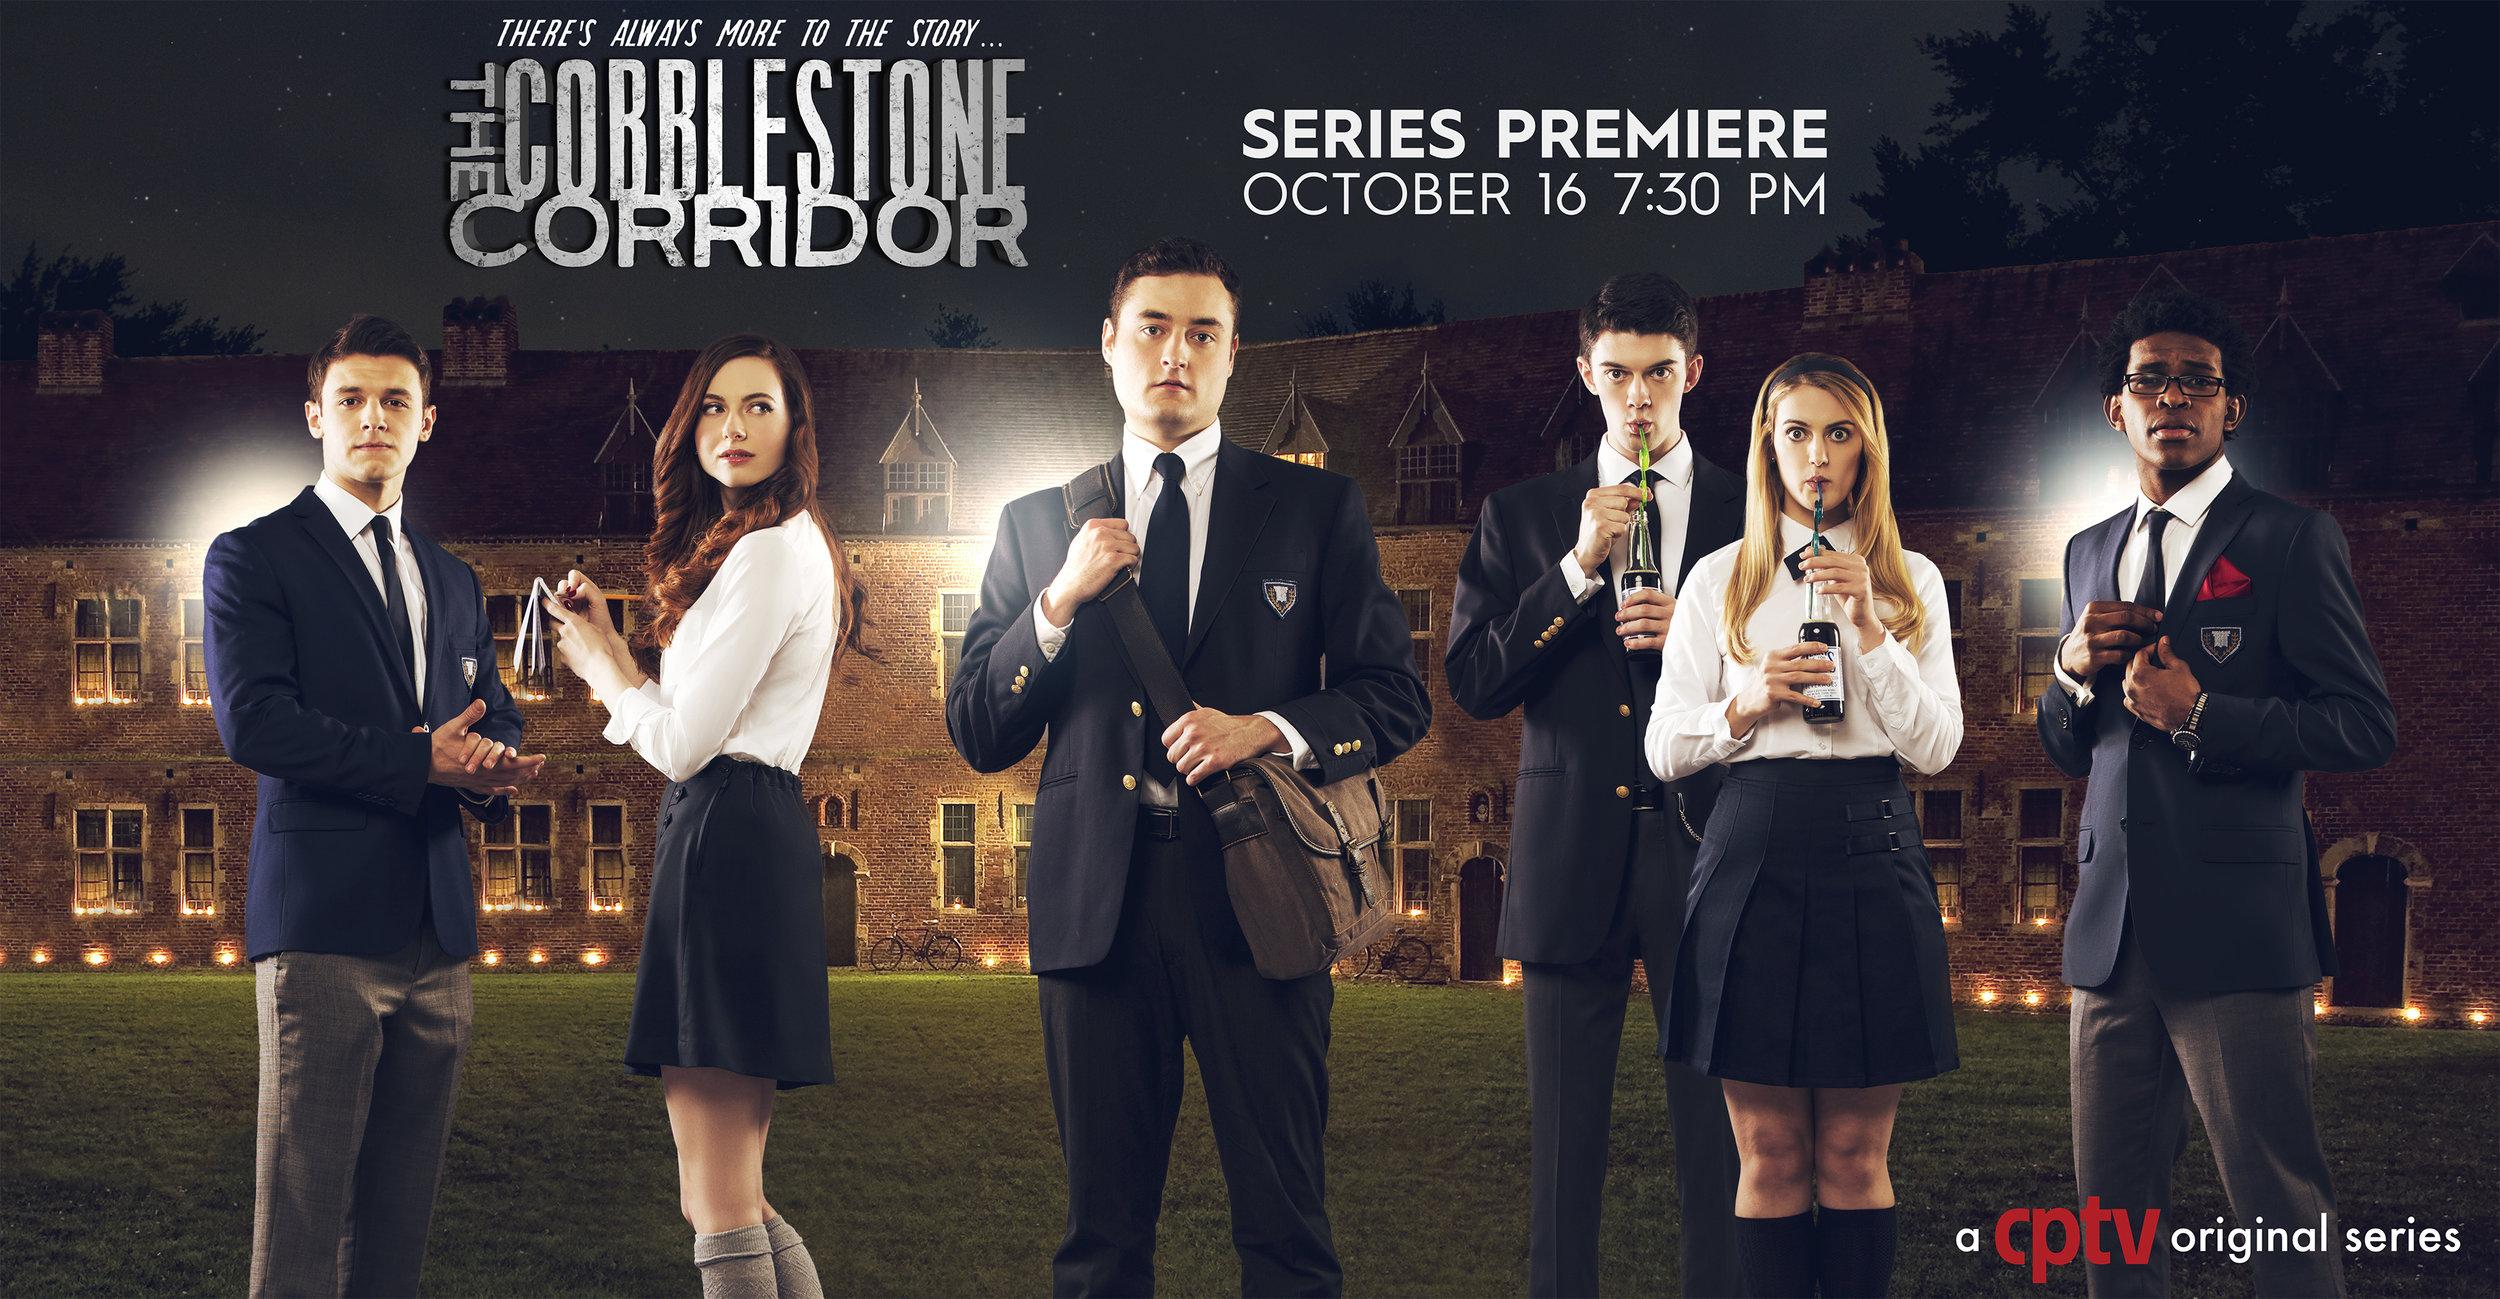 The Cobblestone Corridor (airing October 16)